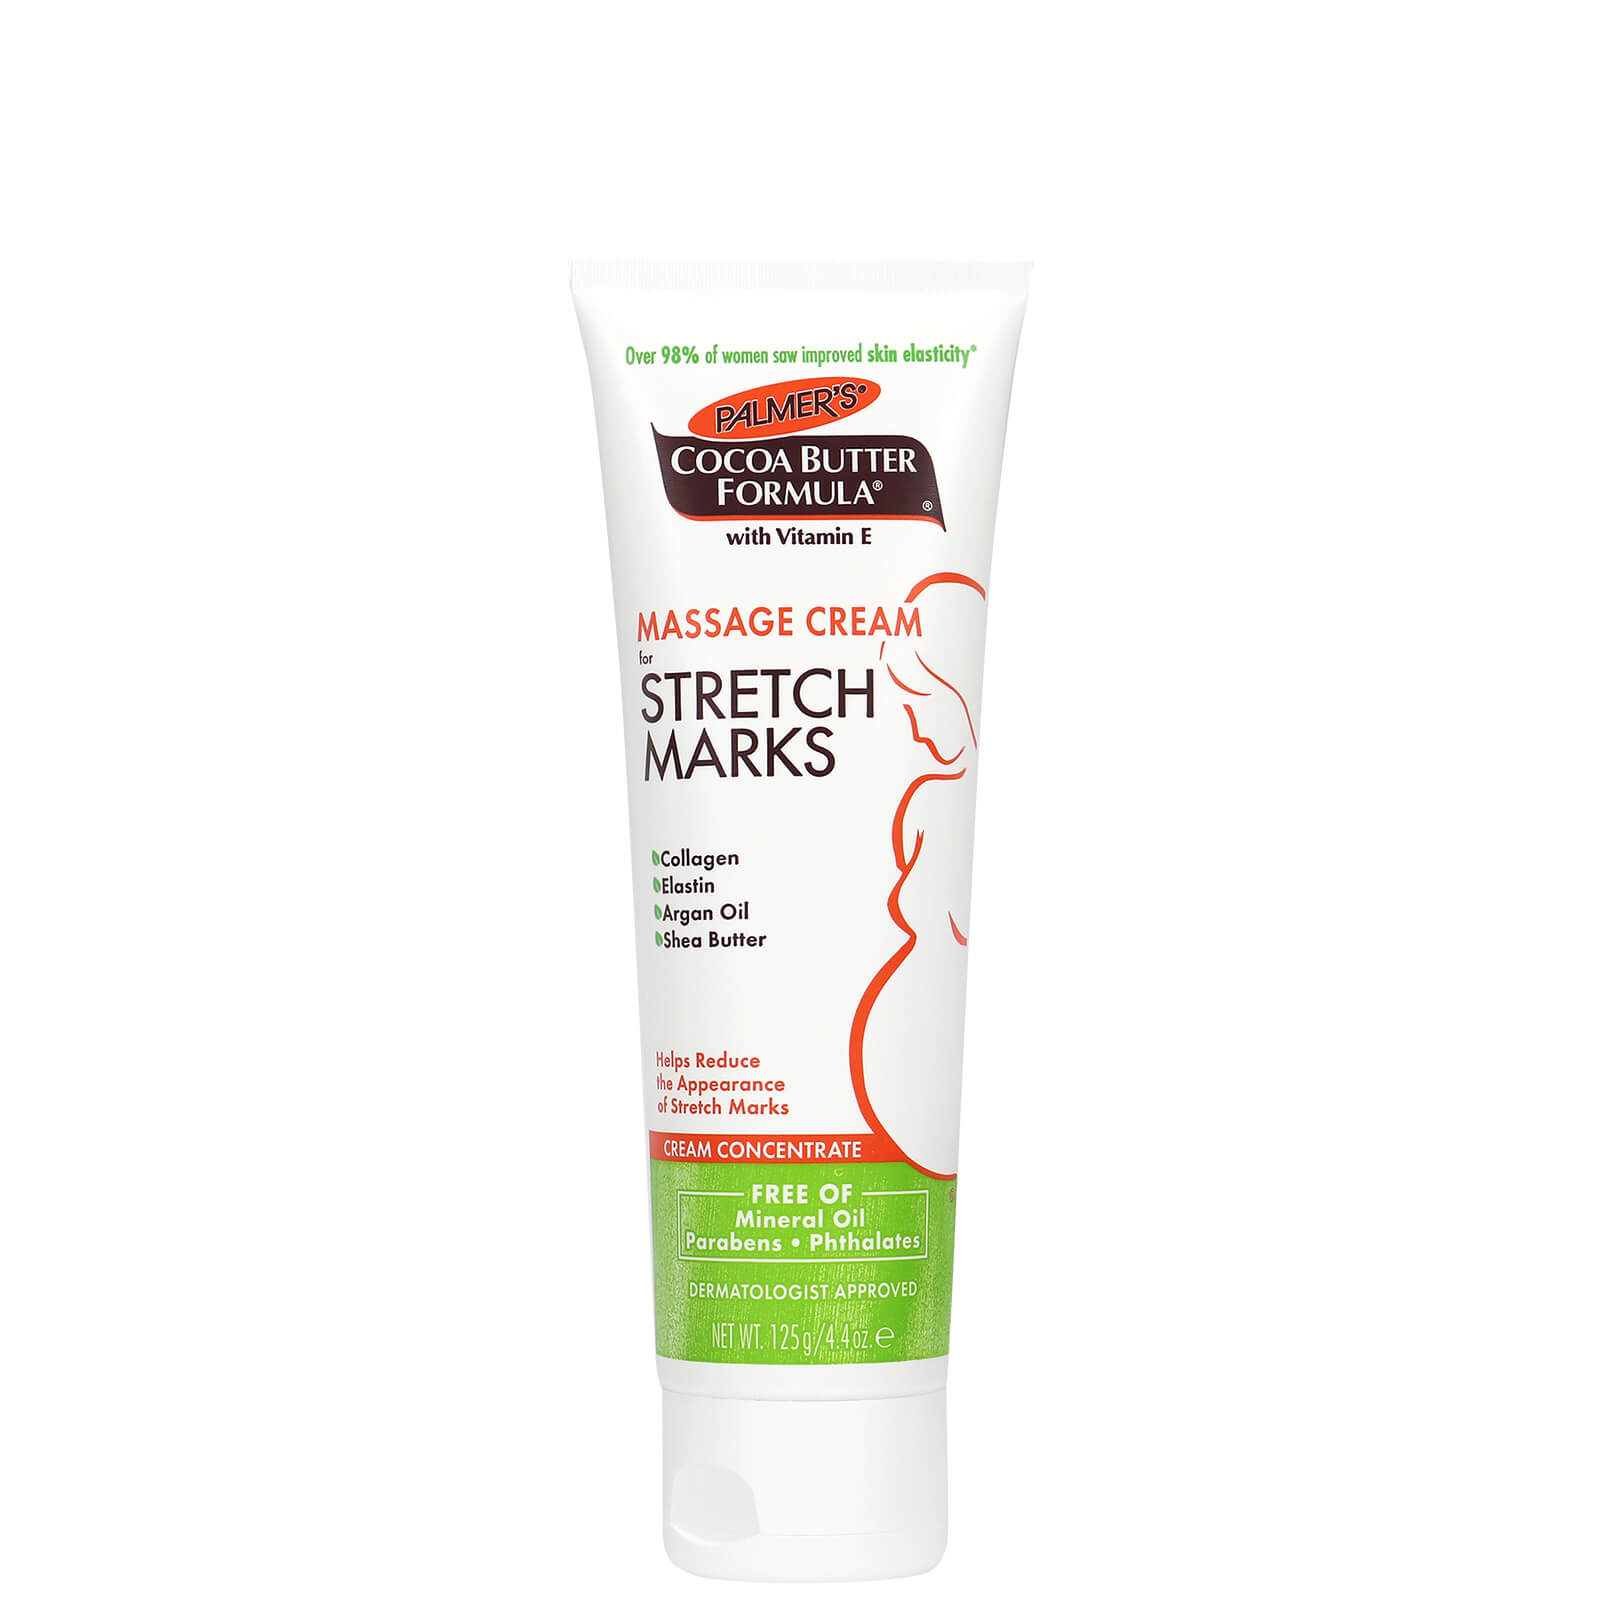 Palmer's Cocoa Butter Formula Massage Cream for Stretch Marks 125g